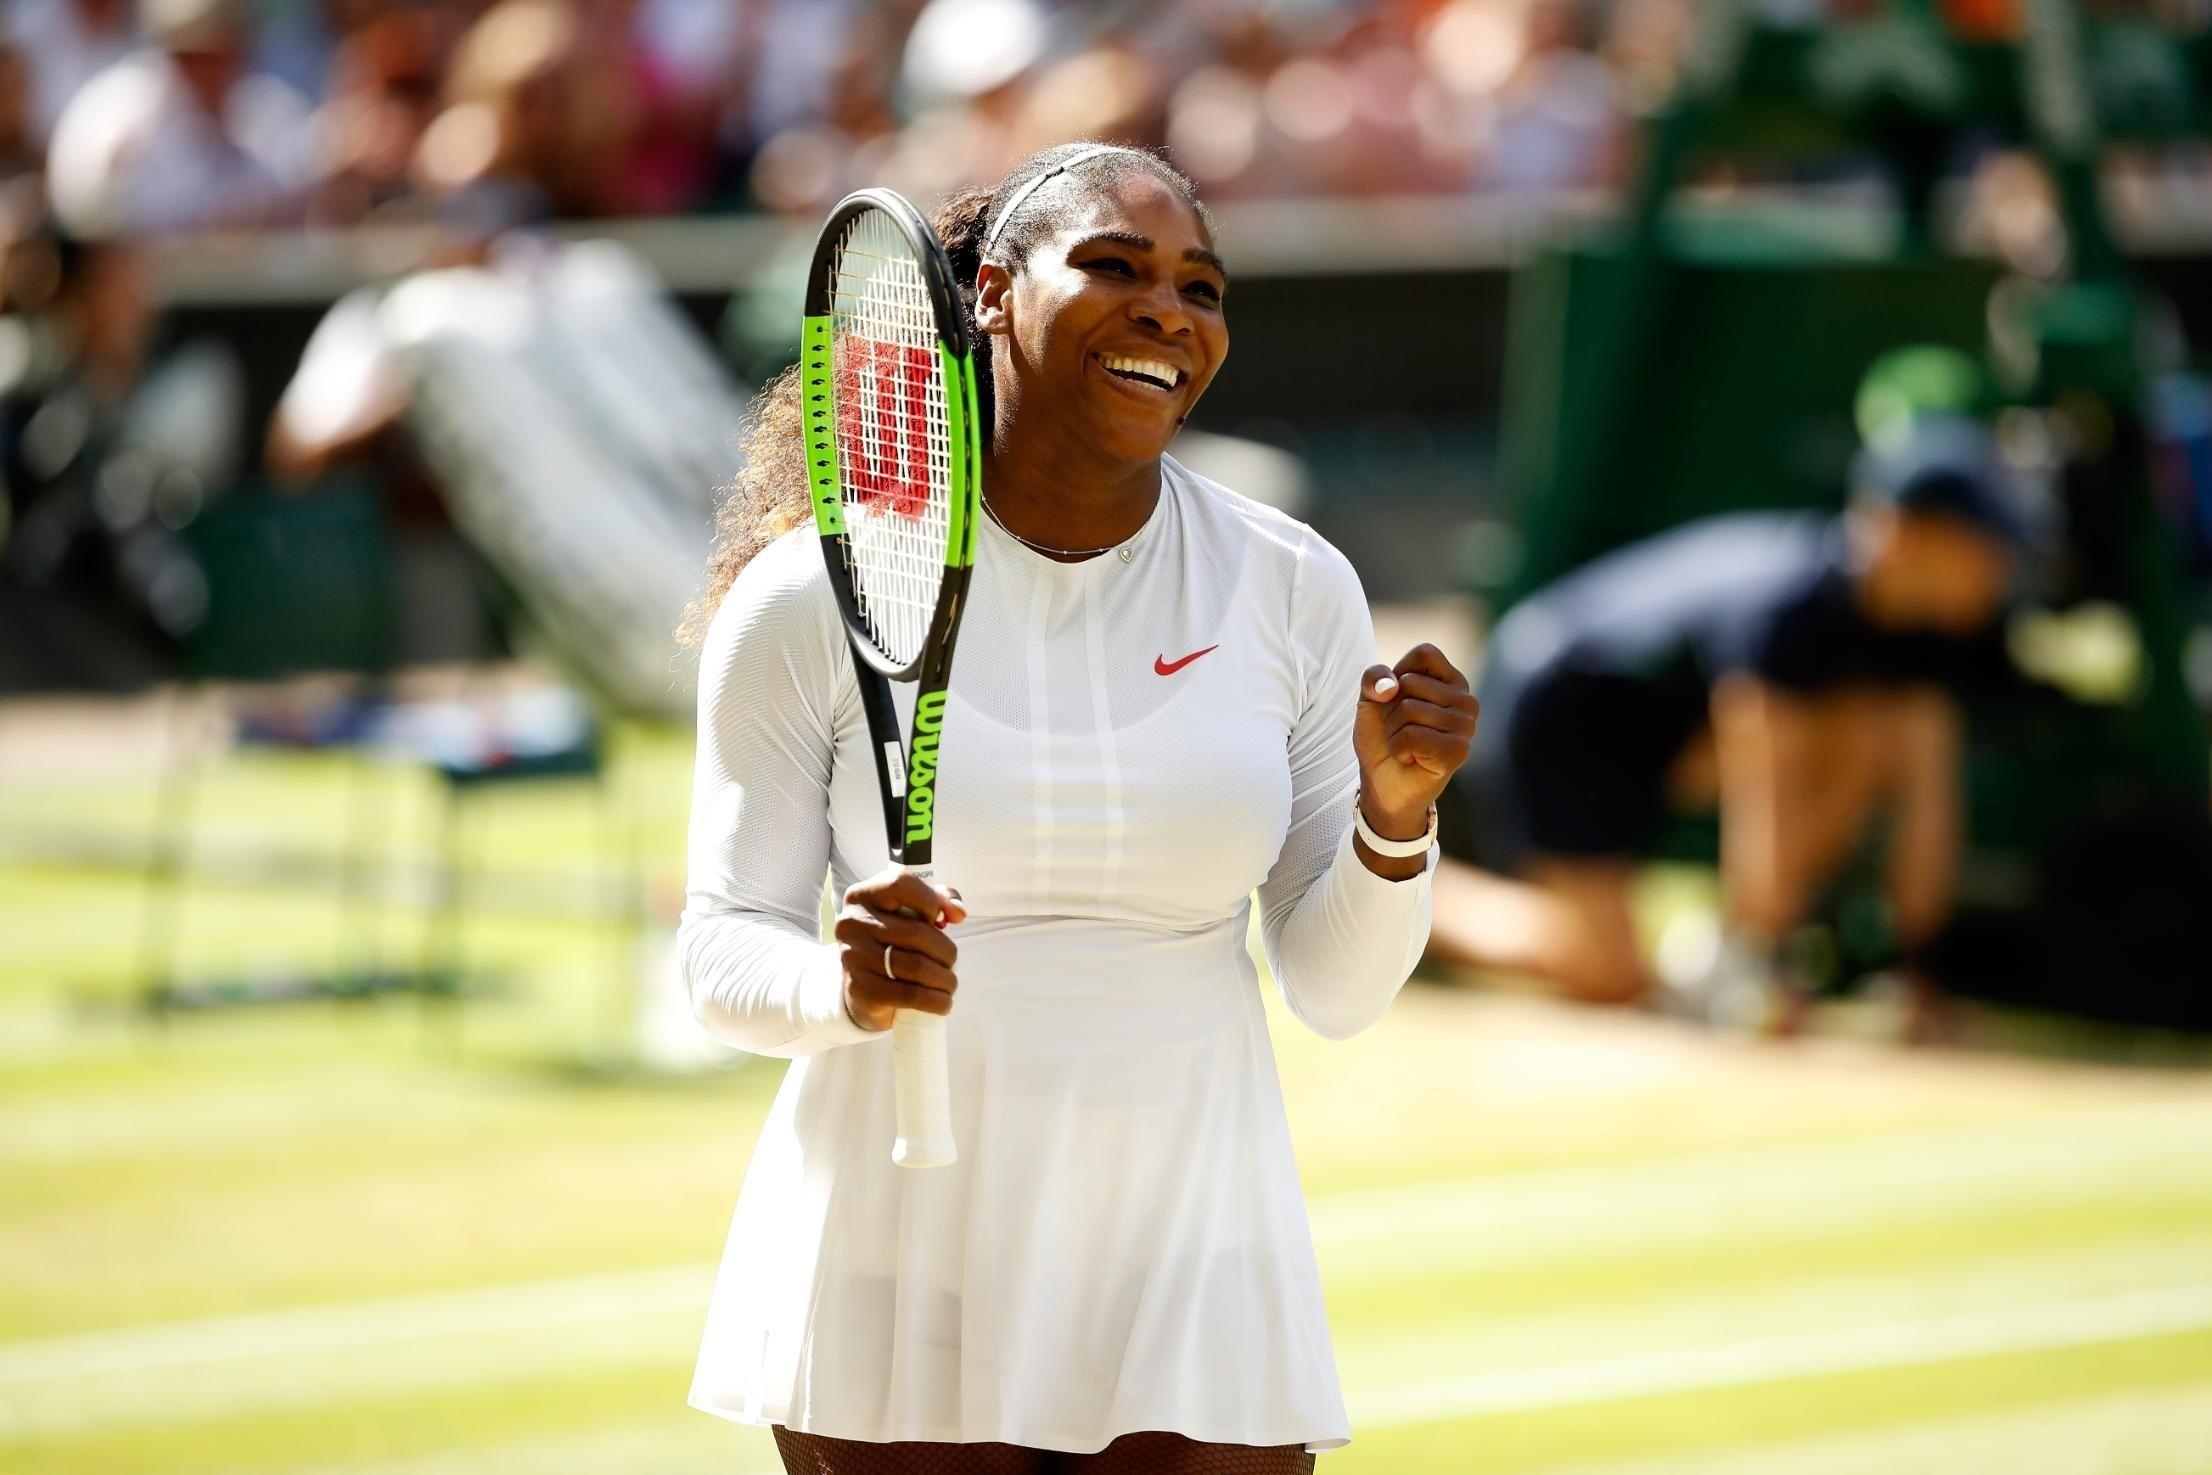 Serena Williams beat Camila Giorgi to make the Wimbledon semifinals.